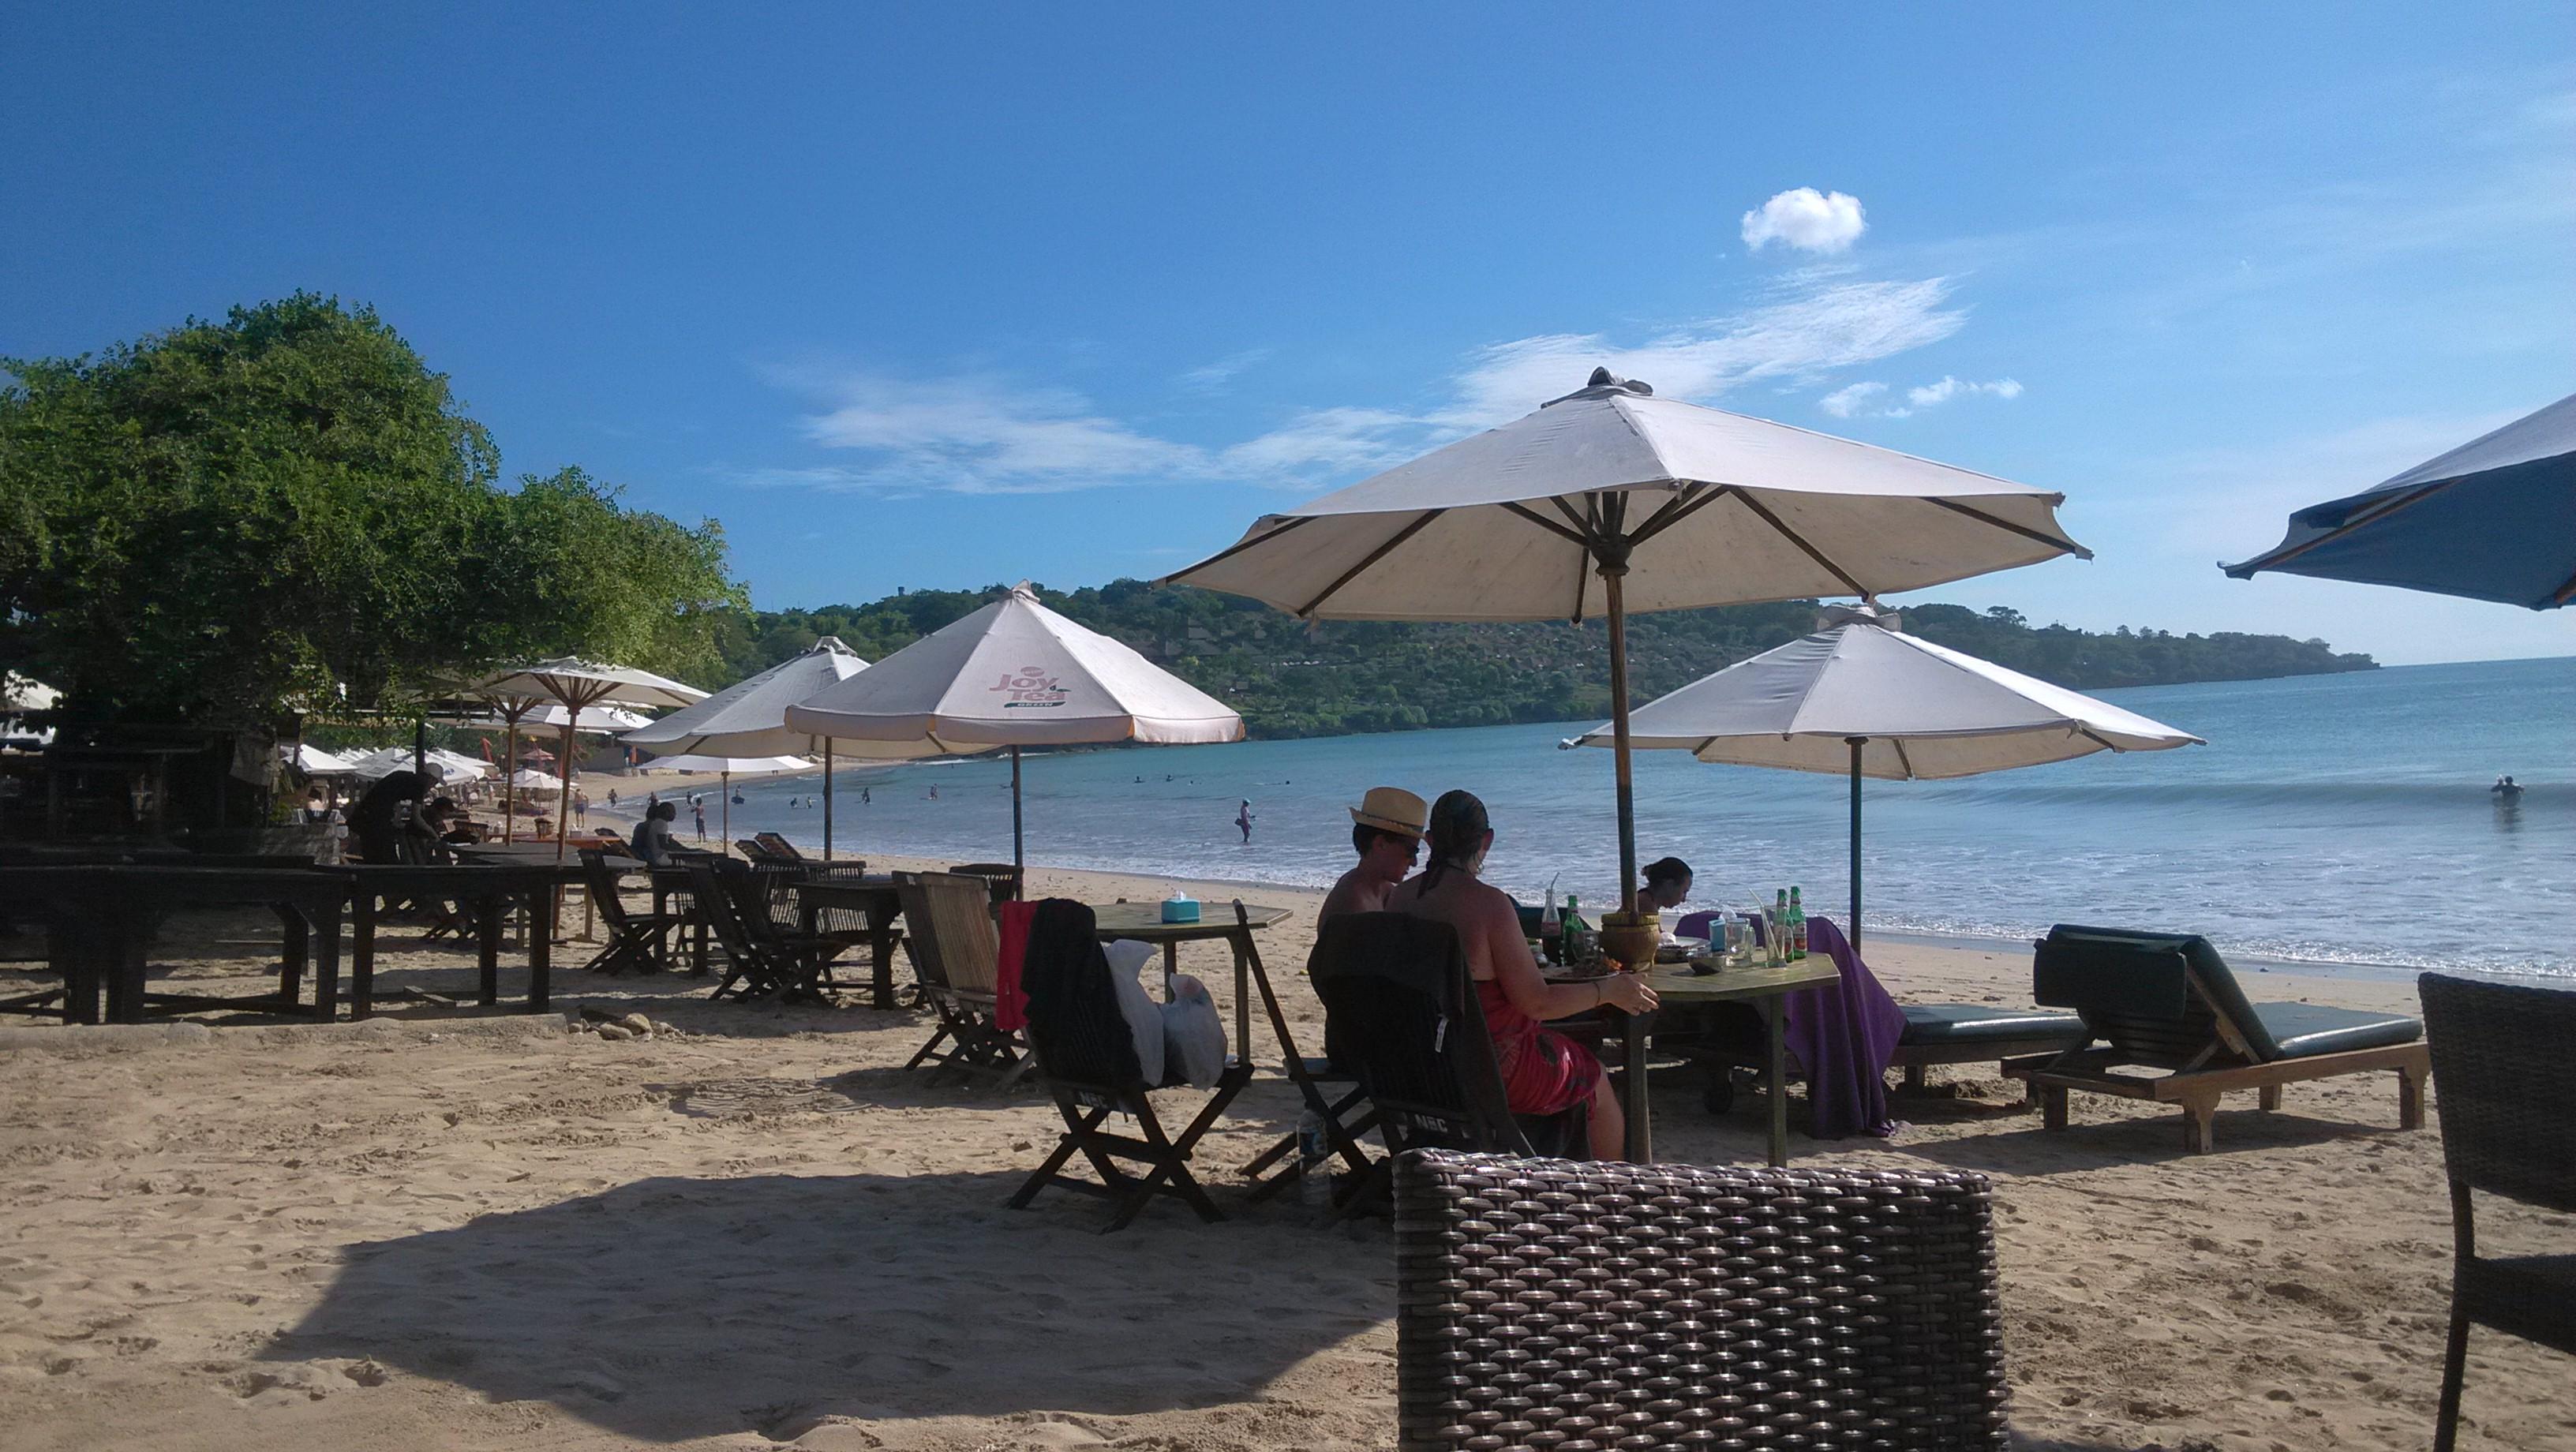 海边风景伞图片